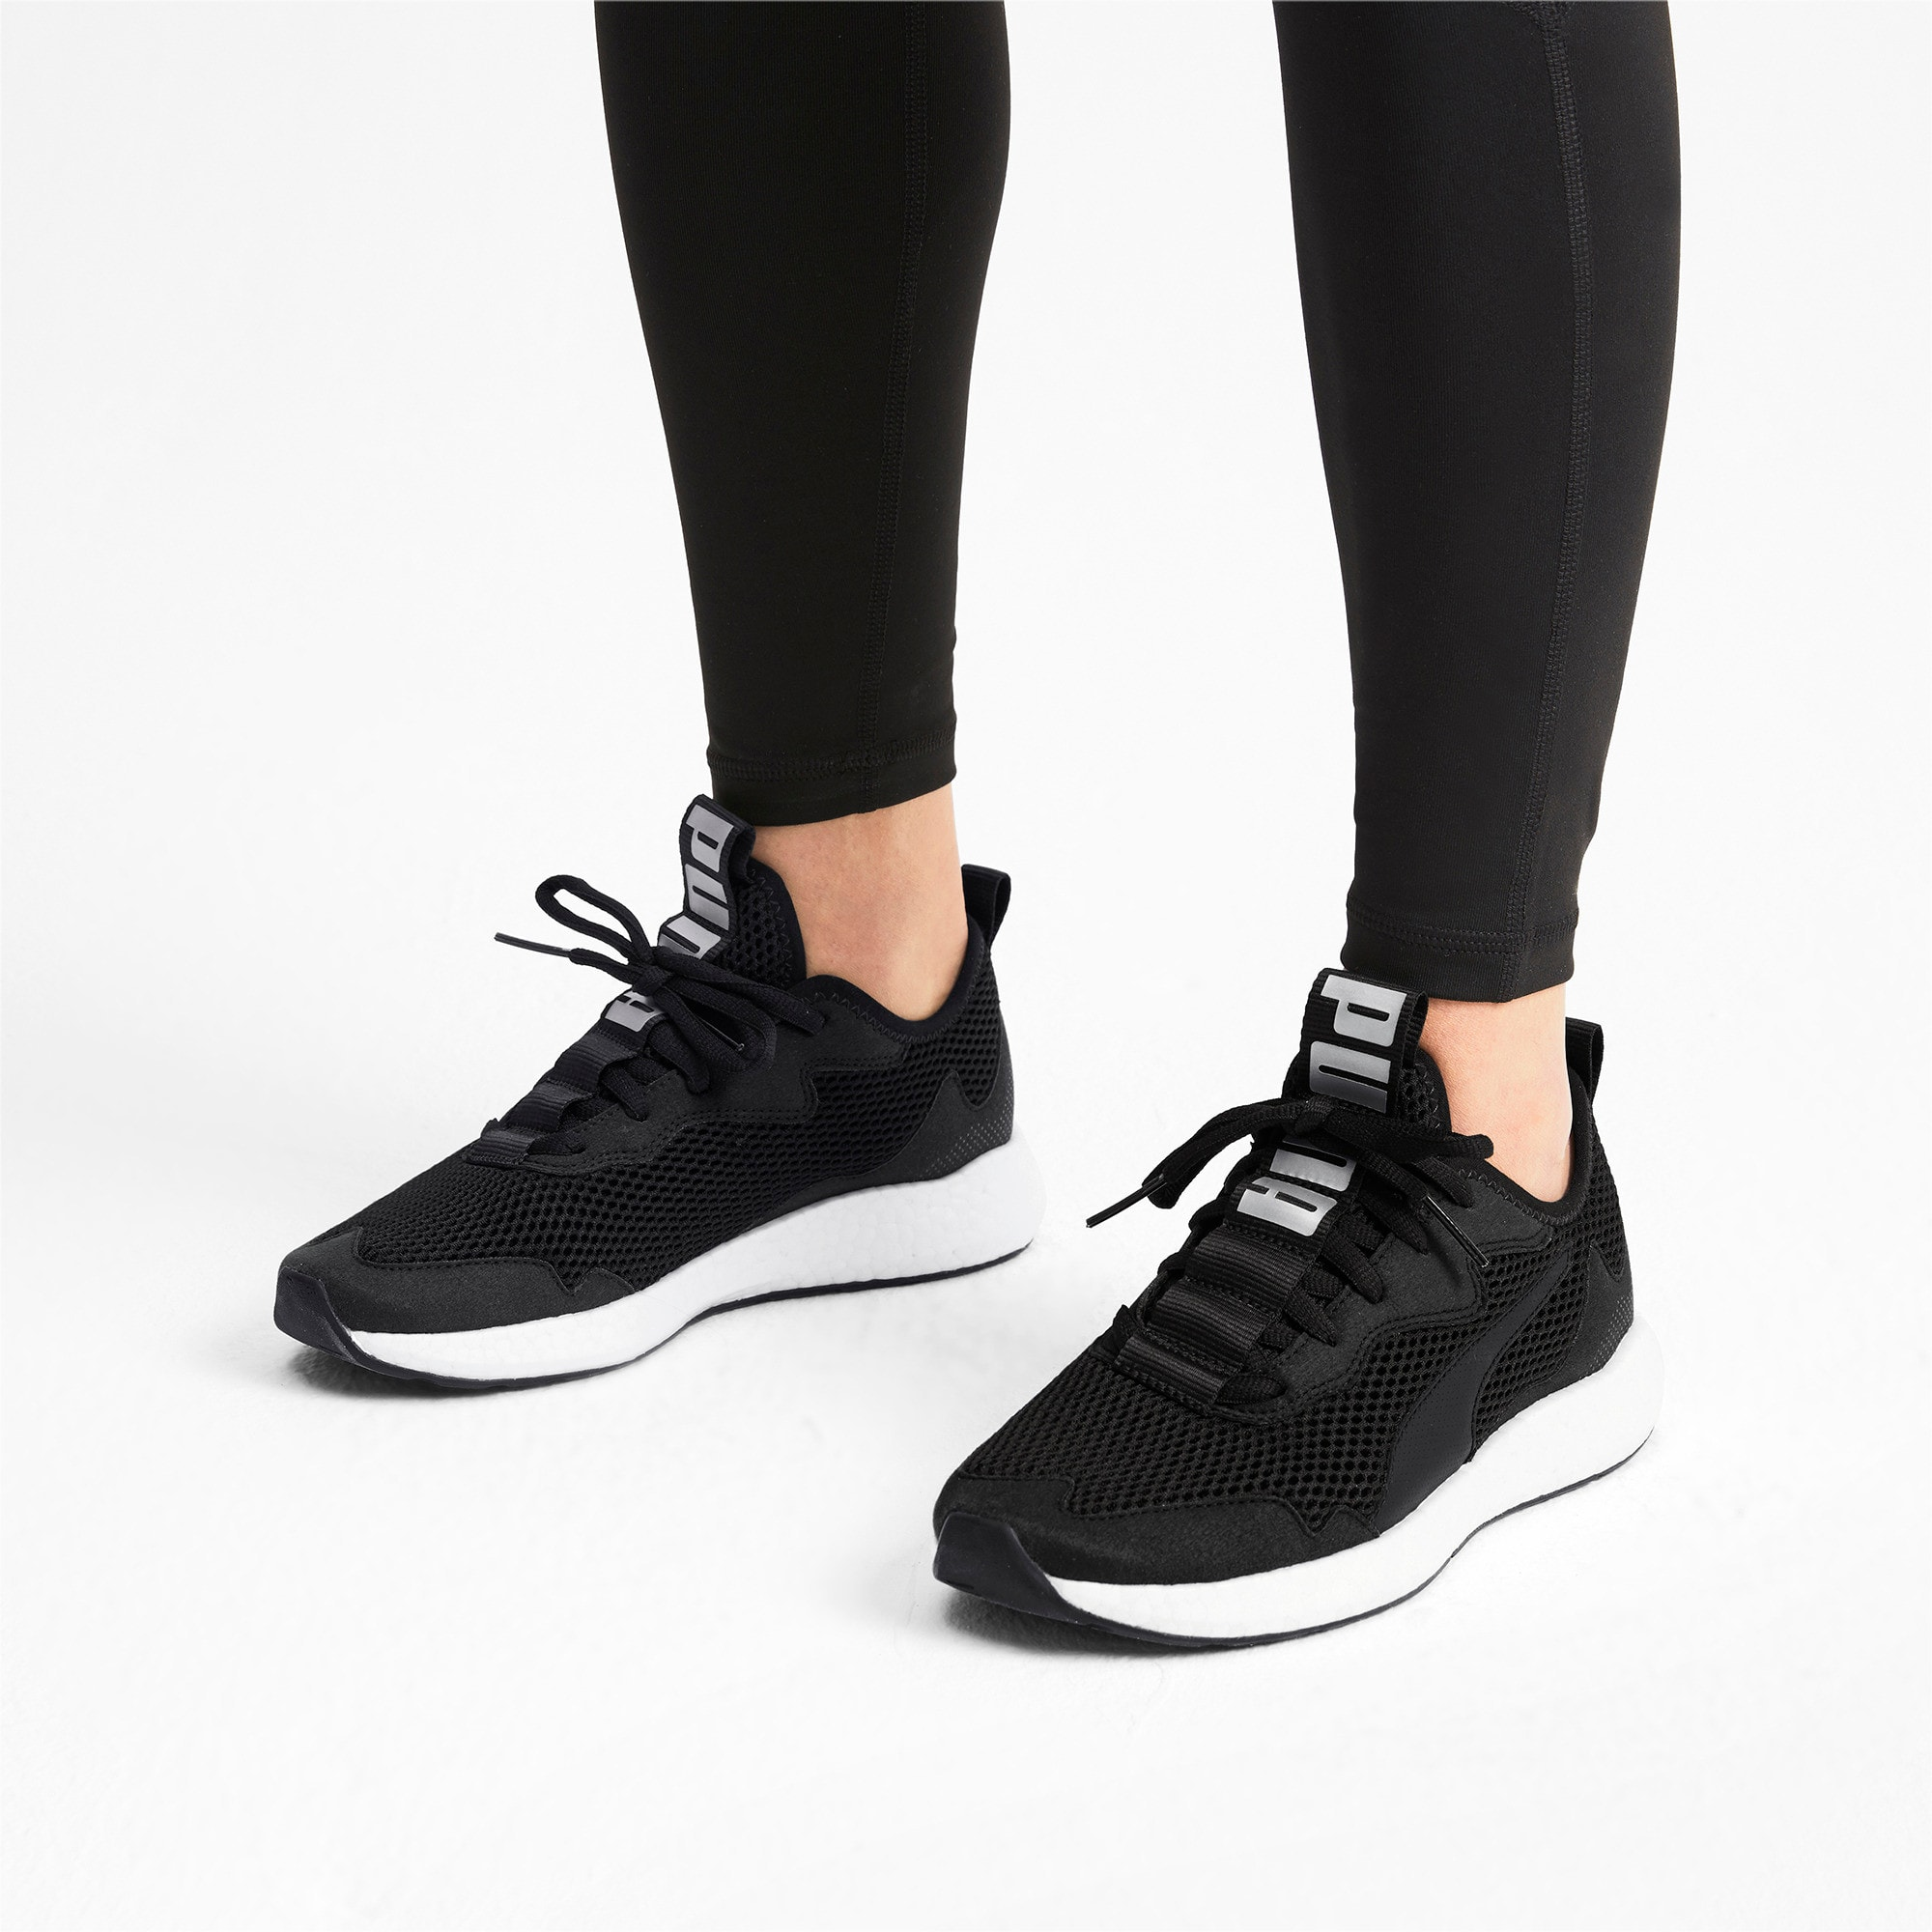 Thumbnail 2 of NRGY Neko Skim Women's Running Shoes, Puma Black-Puma Silver, medium